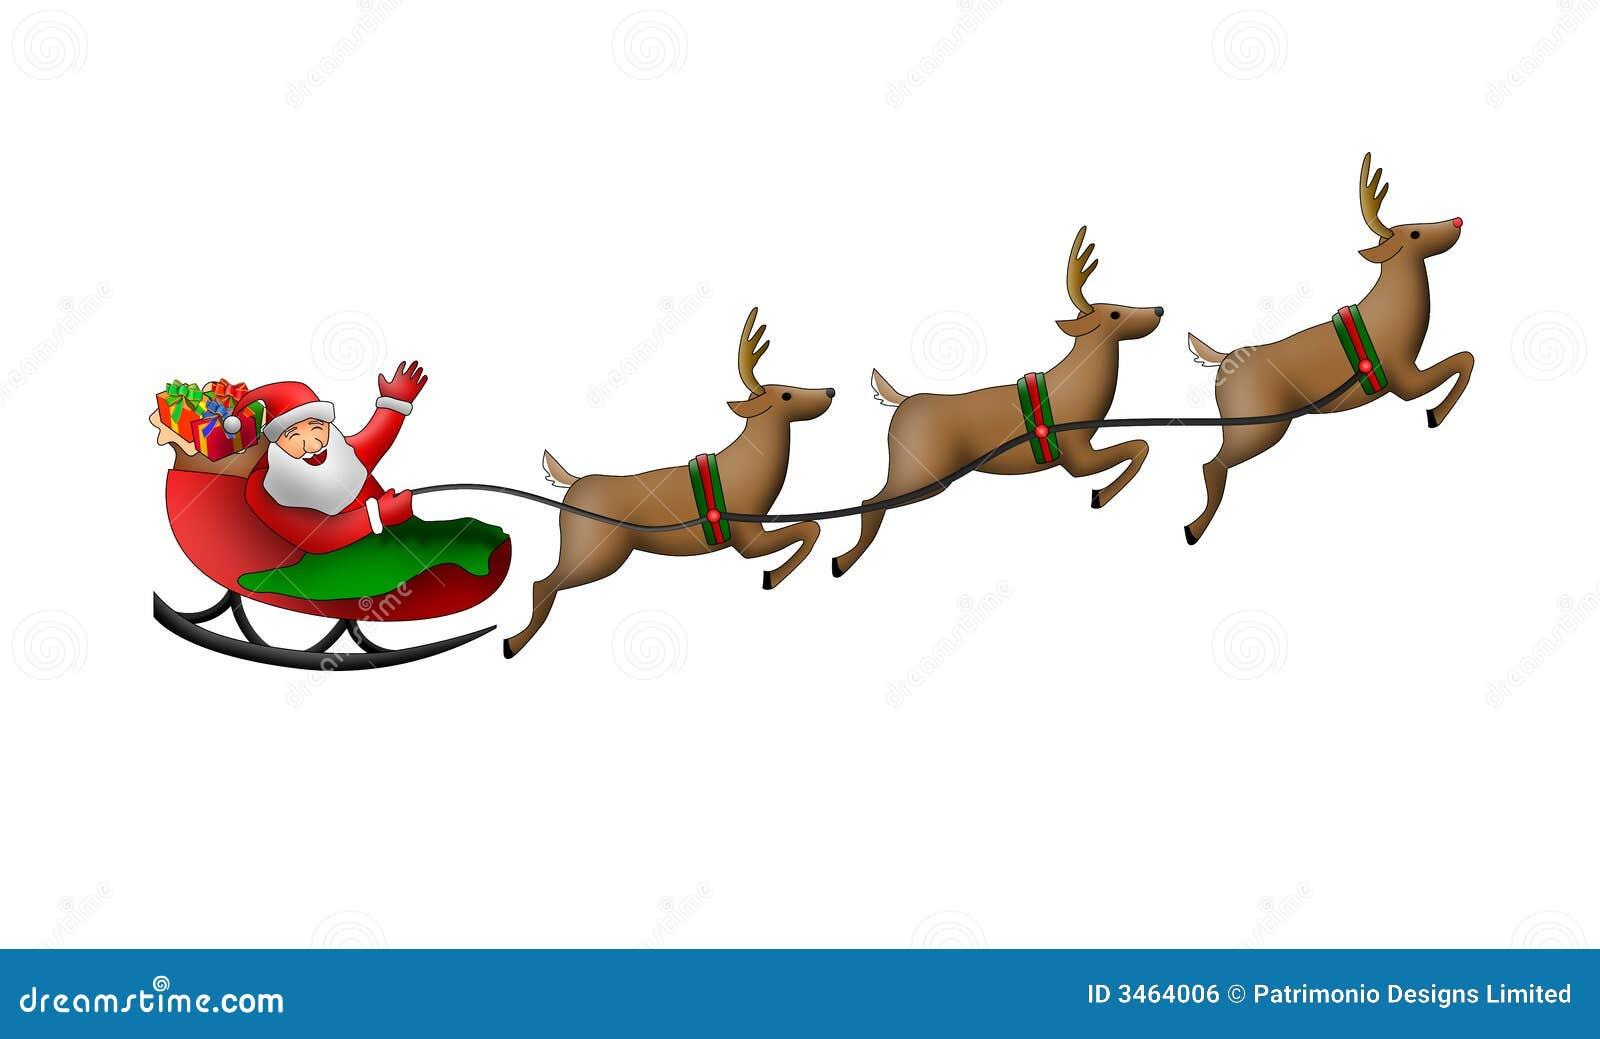 santa claus in his sleigh stock illustration illustration of